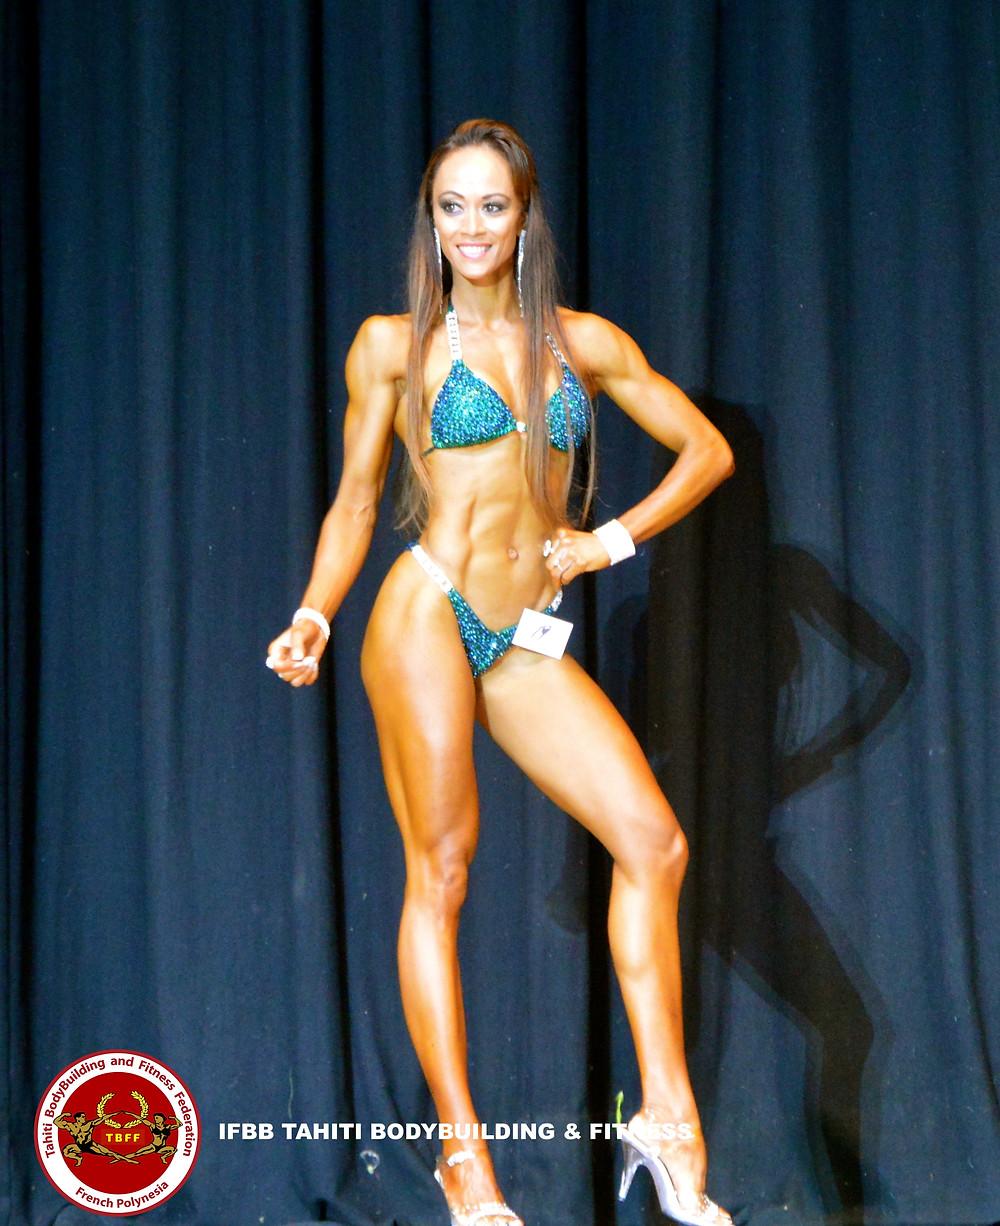 Temoemoe FAREMIRO - IFBB Elite Pro Bikini Fitness